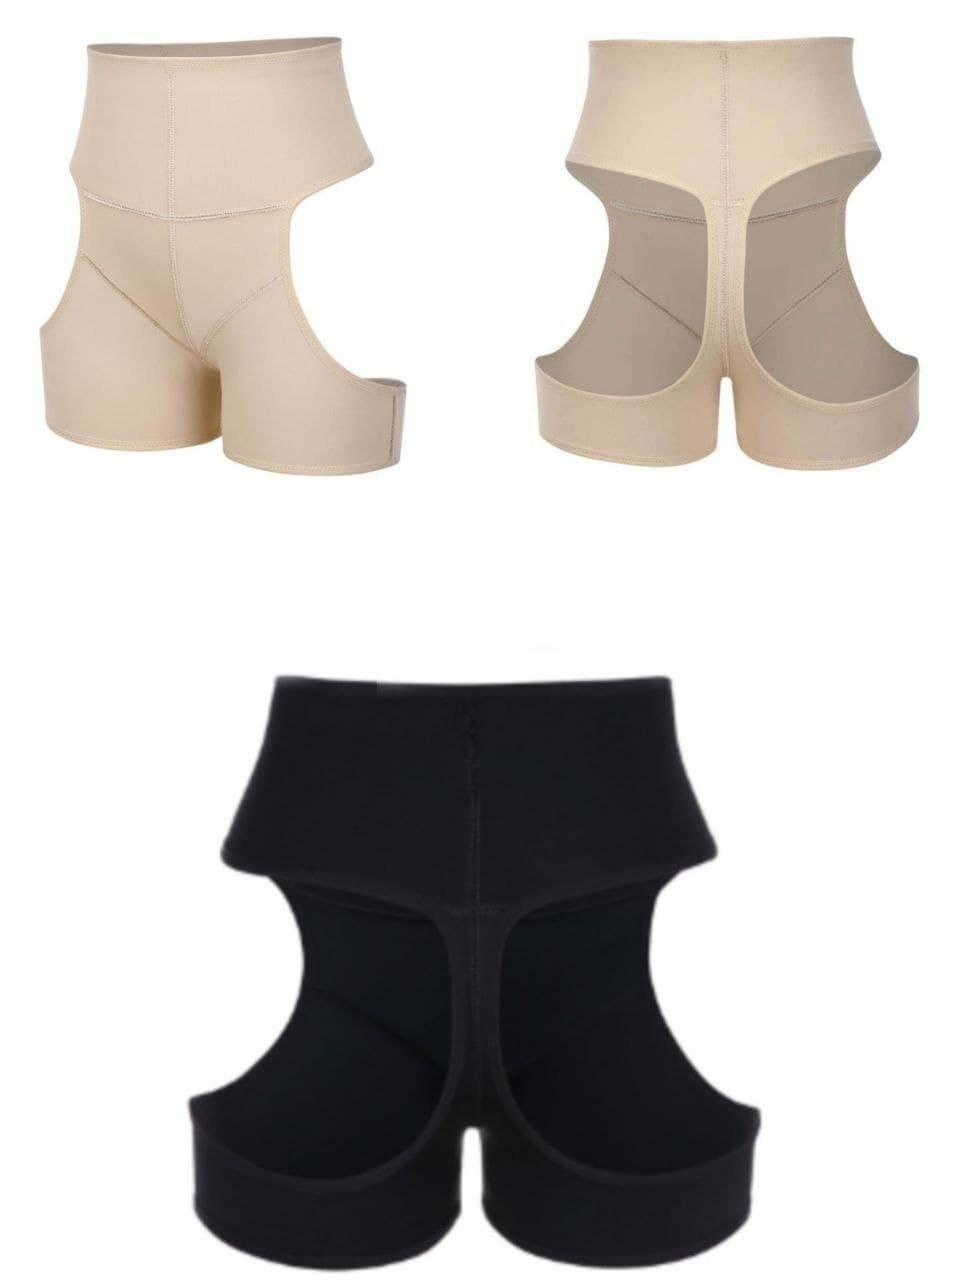 High-waist shaping pants ከፍተኛ ወገብ ቅርፅ ያለው ሱሪ